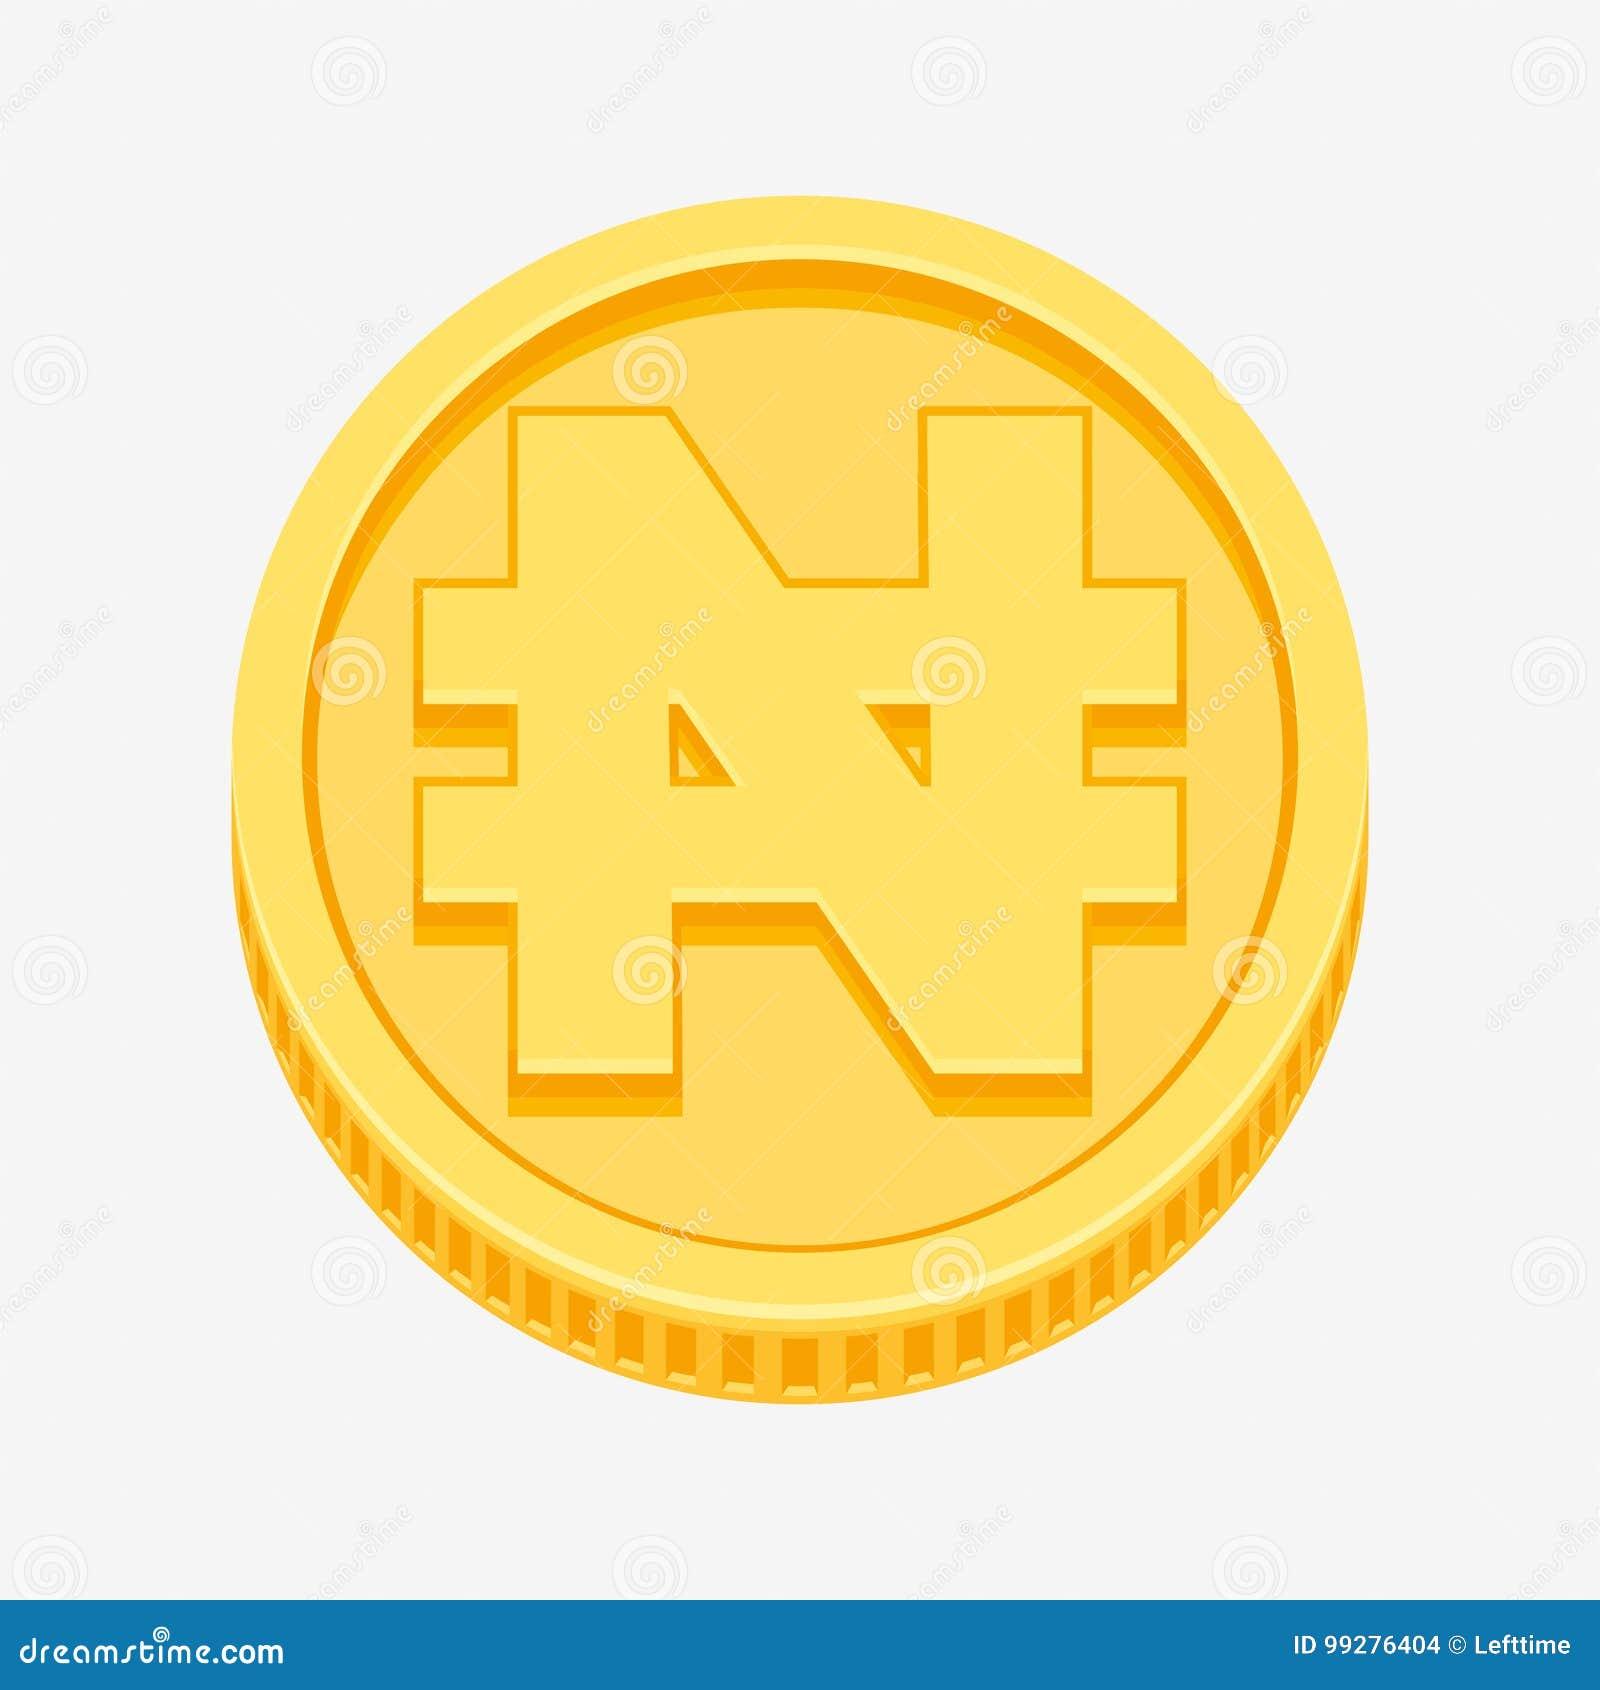 Nigerian Naira Symbol On Gold Coin Stock Vector Illustration Of